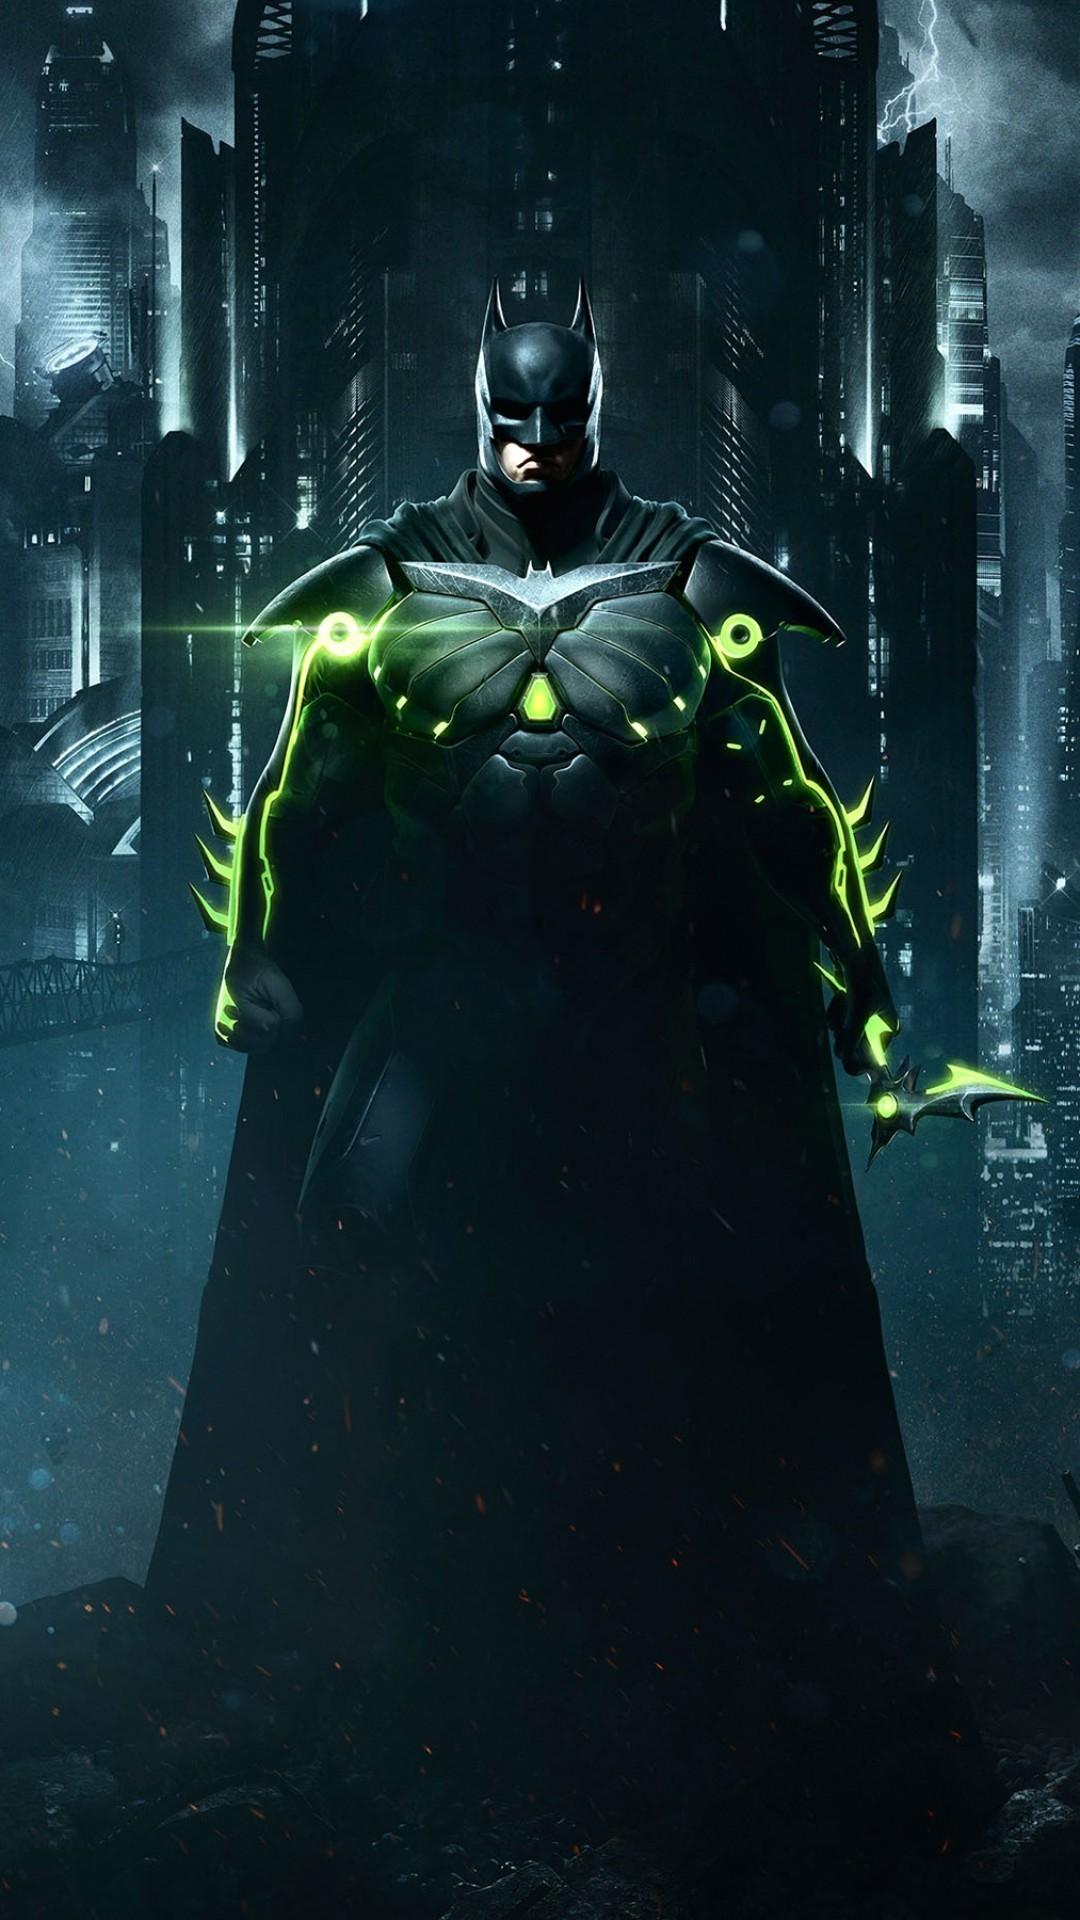 Batman, Injustice 2, Cityscape, Artwork - Injustice 2 Wallpaper Phone - HD Wallpaper